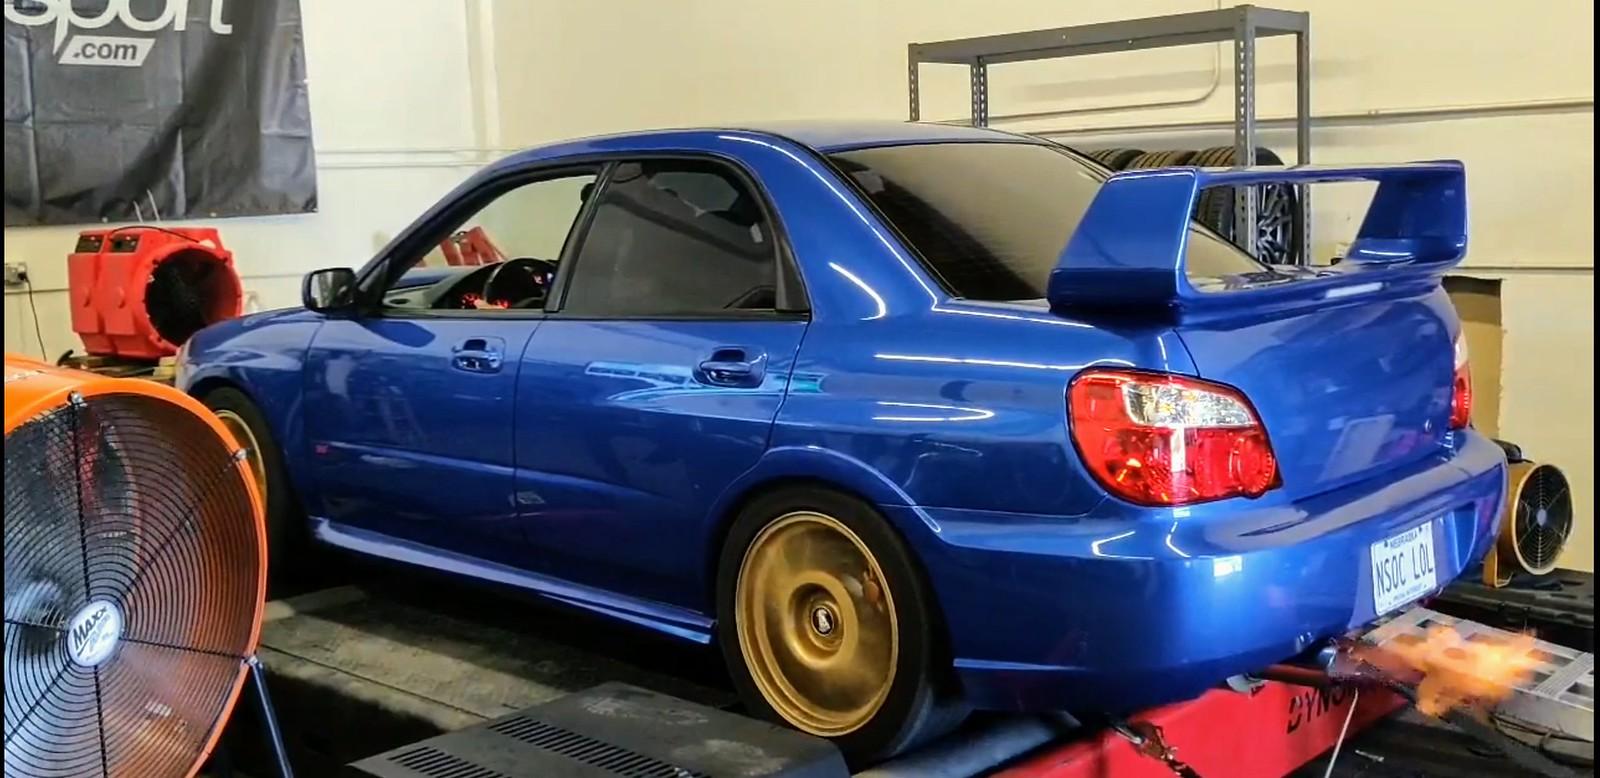 yamahaSHO's Street Car - Officially For Sale!-sti-dyno-flames-jpg